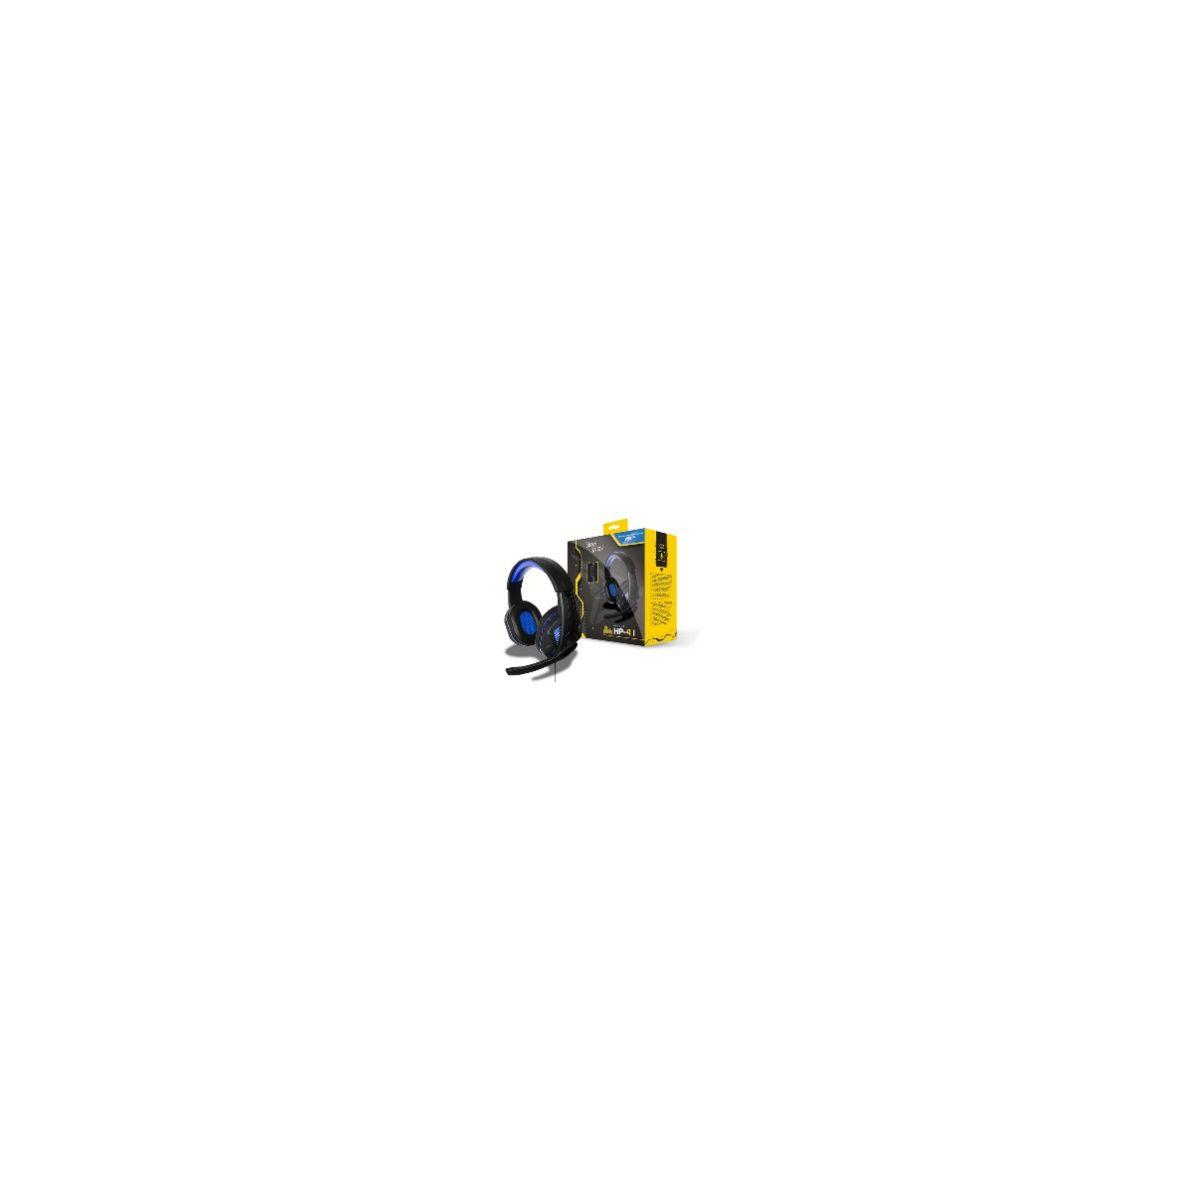 Casque + micro steelplay hp41 - 3% de remise immédiate avec le code : multi3